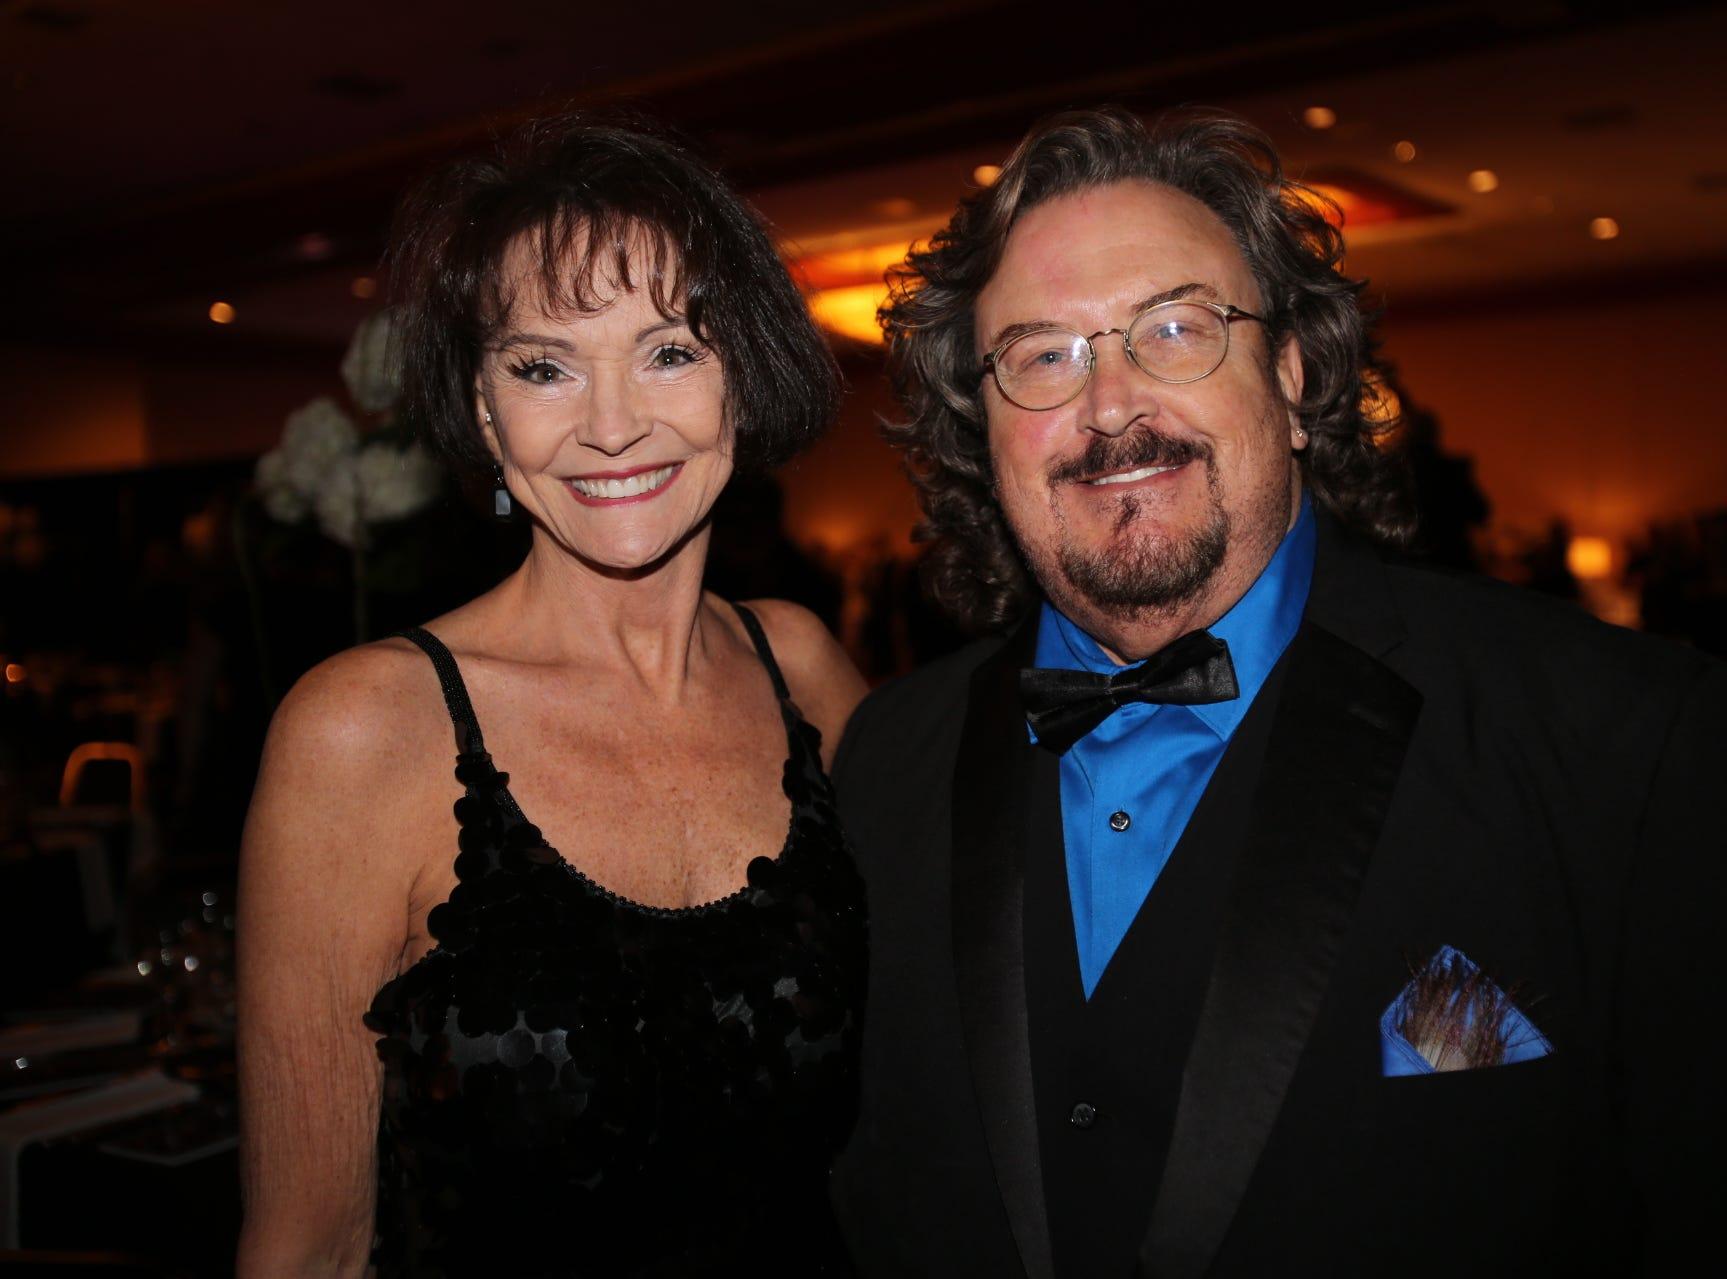 Connie Martin and Joe Tate